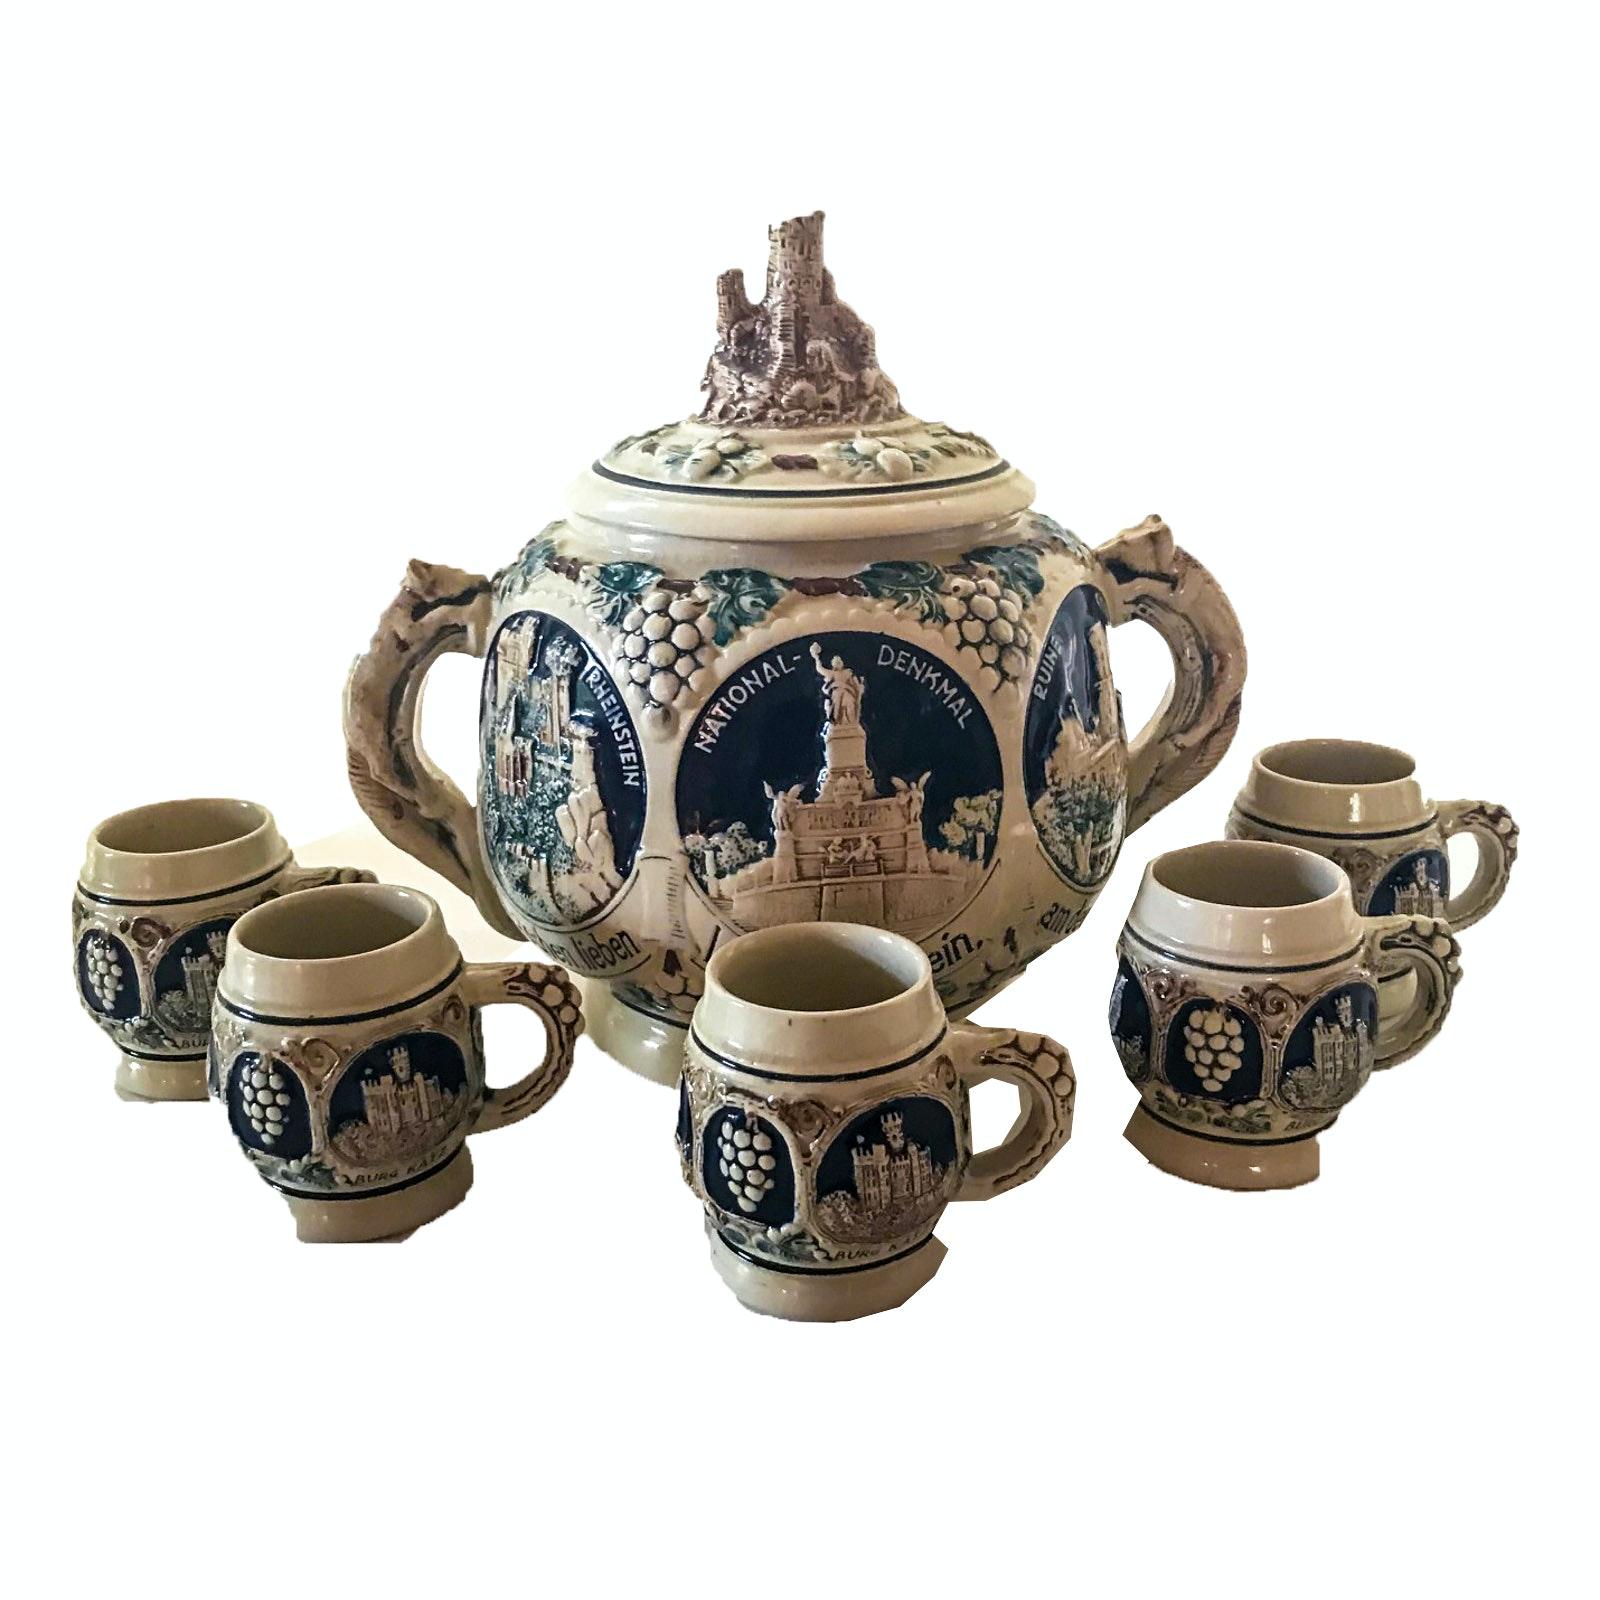 Vintage Gerz Germany Stoneware Punch Bowl and Mugs